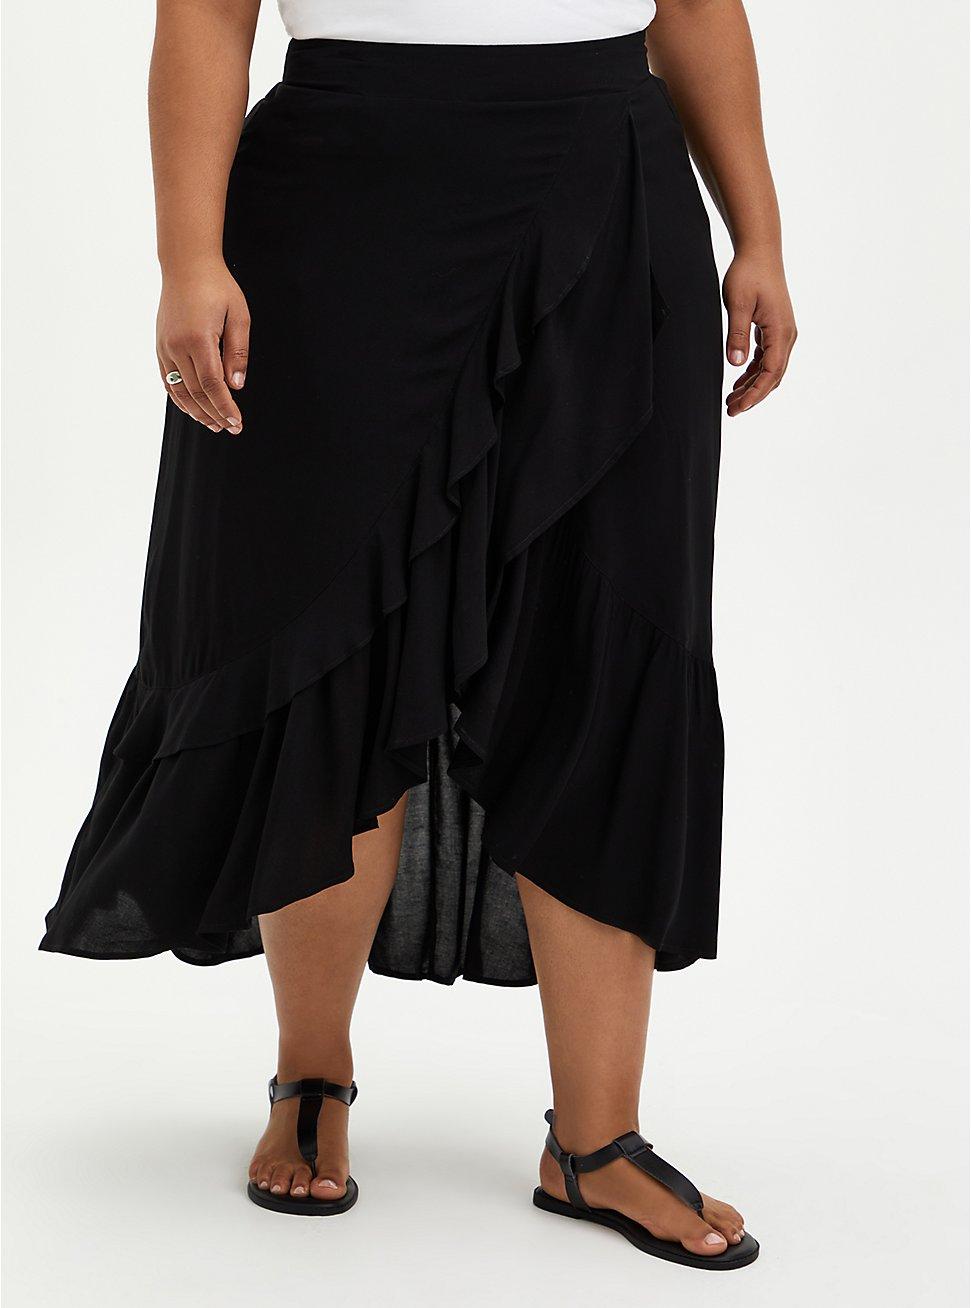 Black Challis Ruffle Hem Hi-Lo Maxi Skirt, DEEP BLACK, hi-res